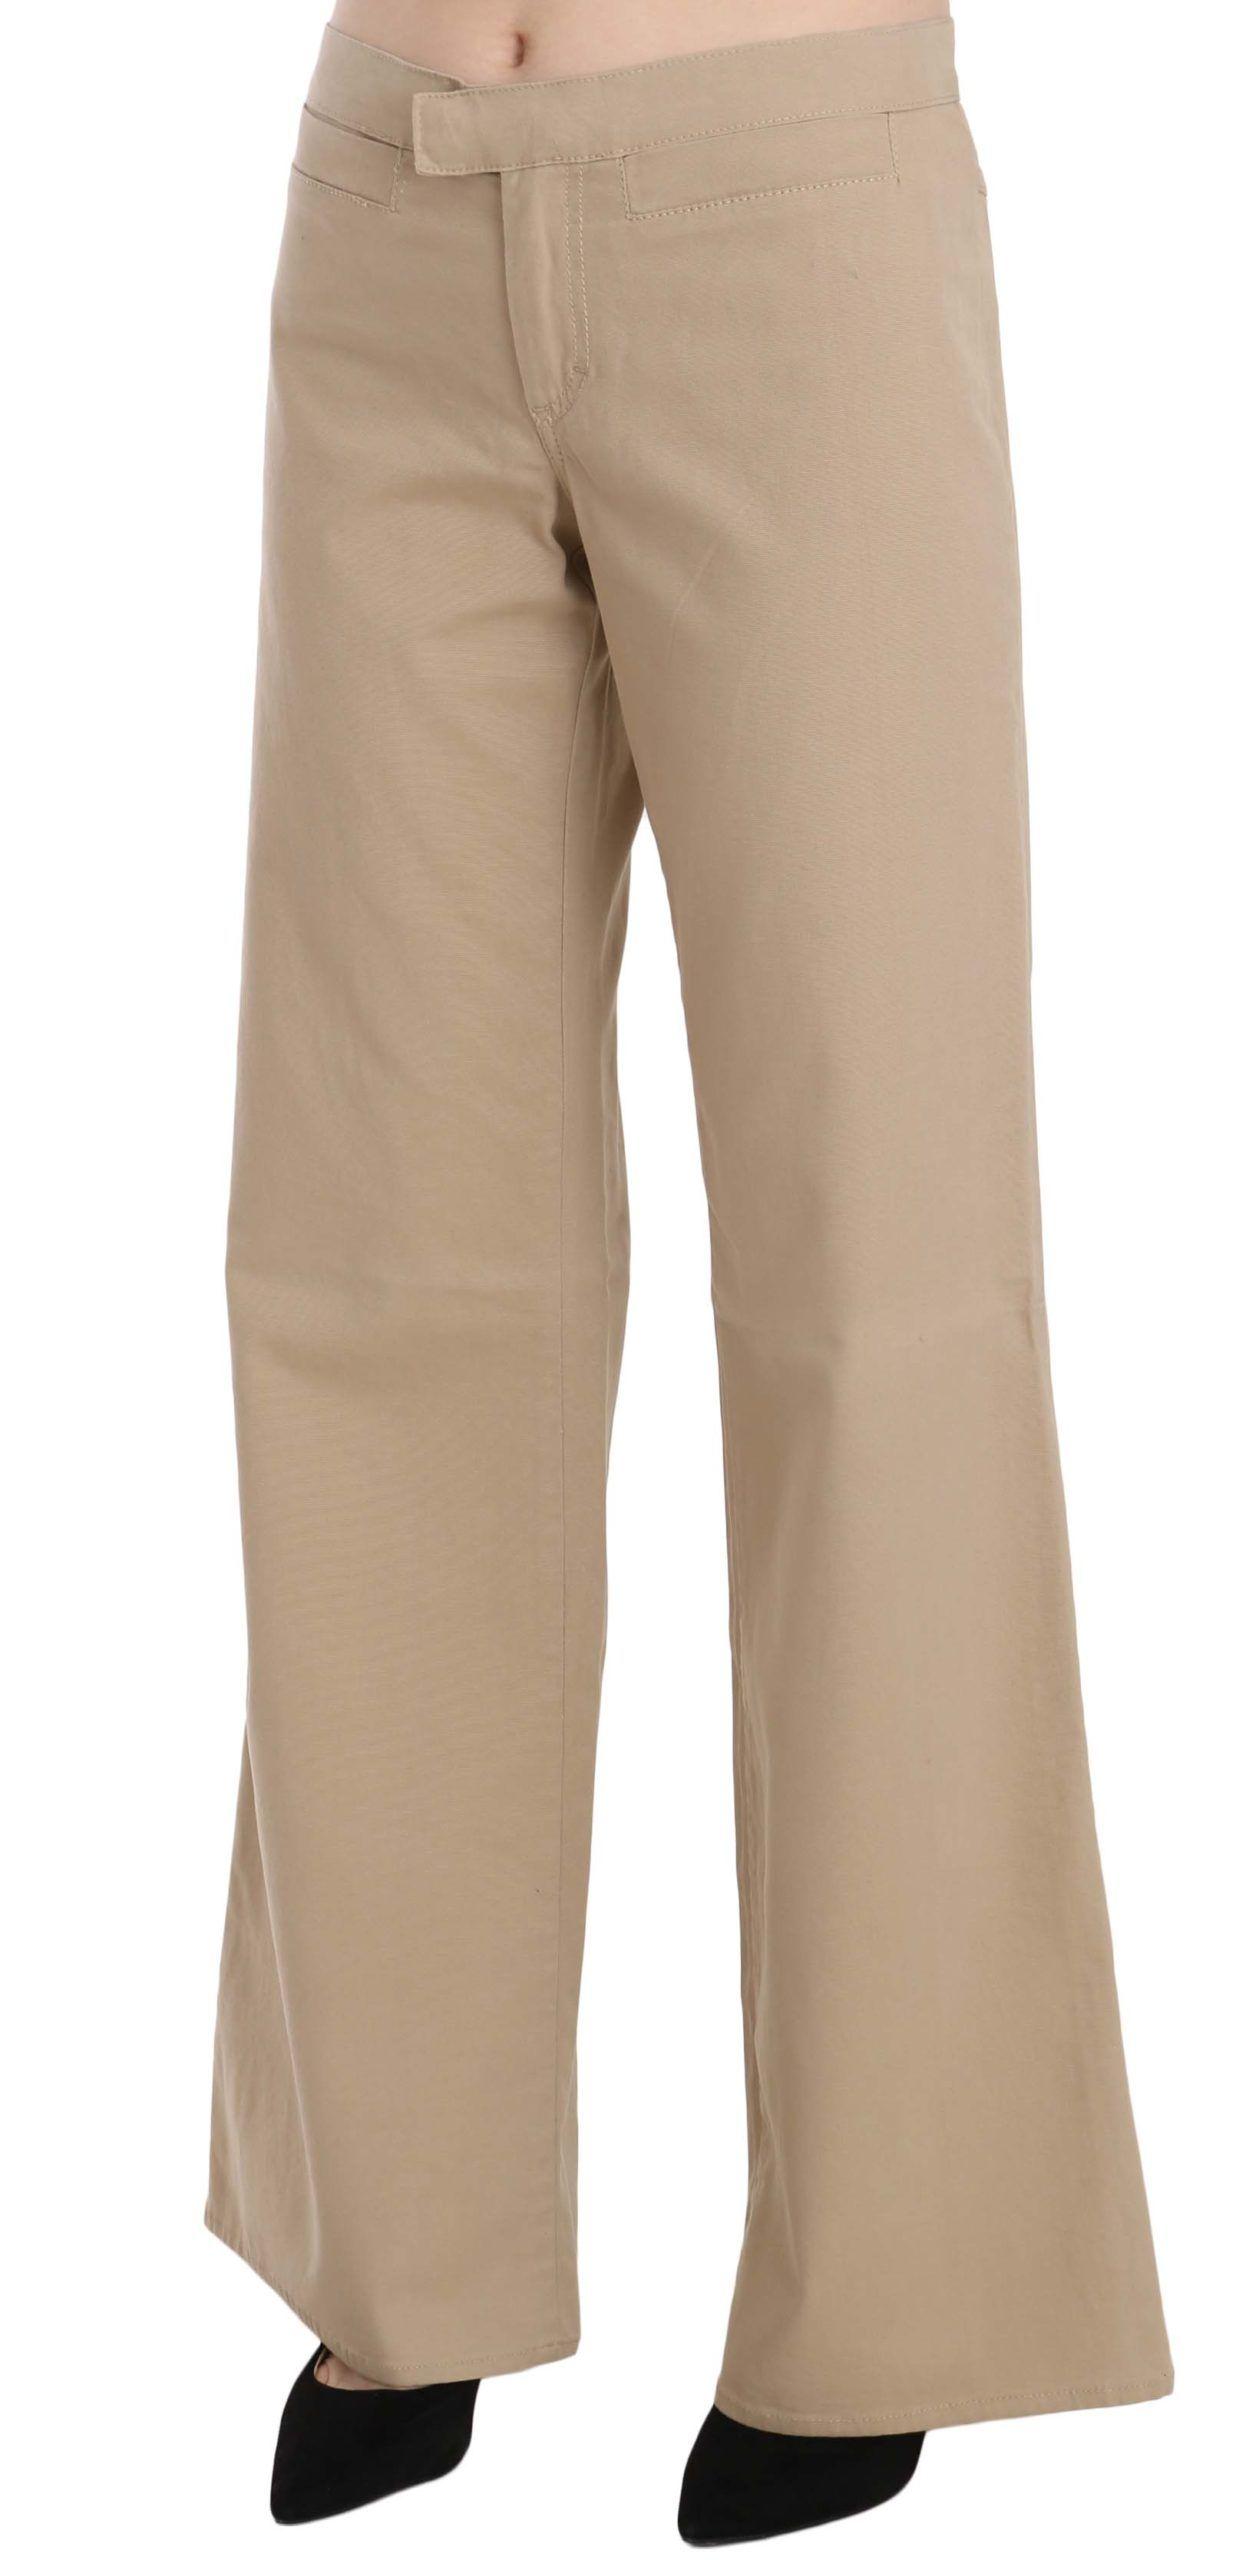 Just Cavalli Beige Cotton Mid Waist Flared Trousers Pants